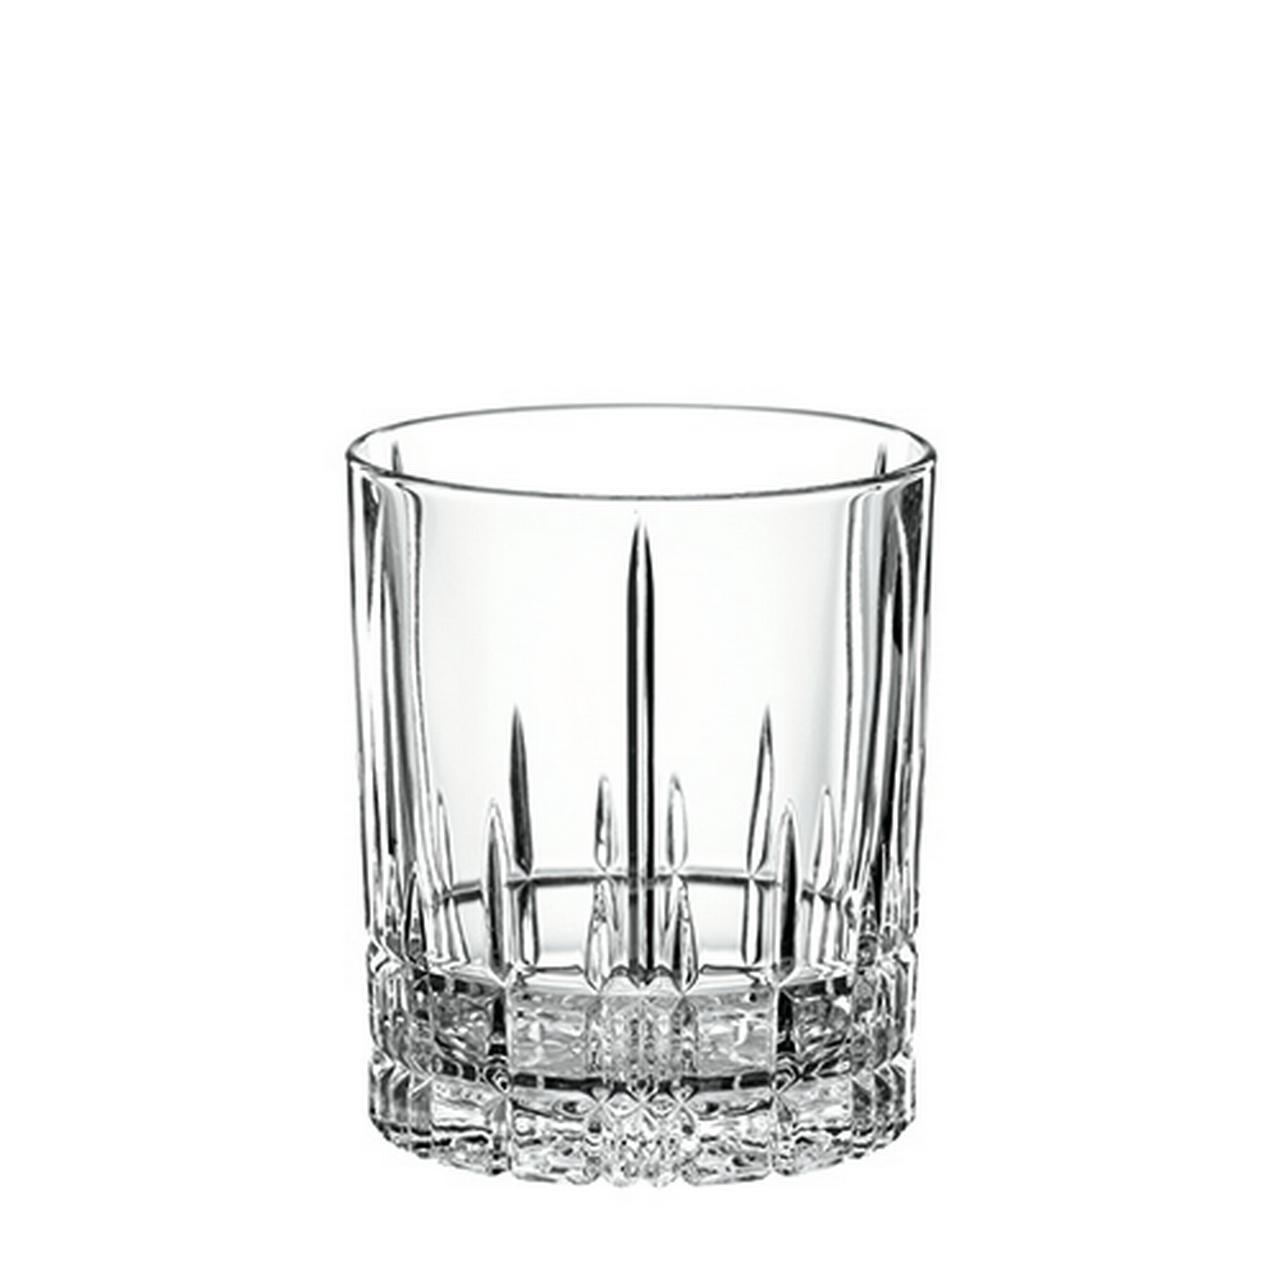 Spiegelau 13 oz Perfect D.O.F. Glass (Set of 4)